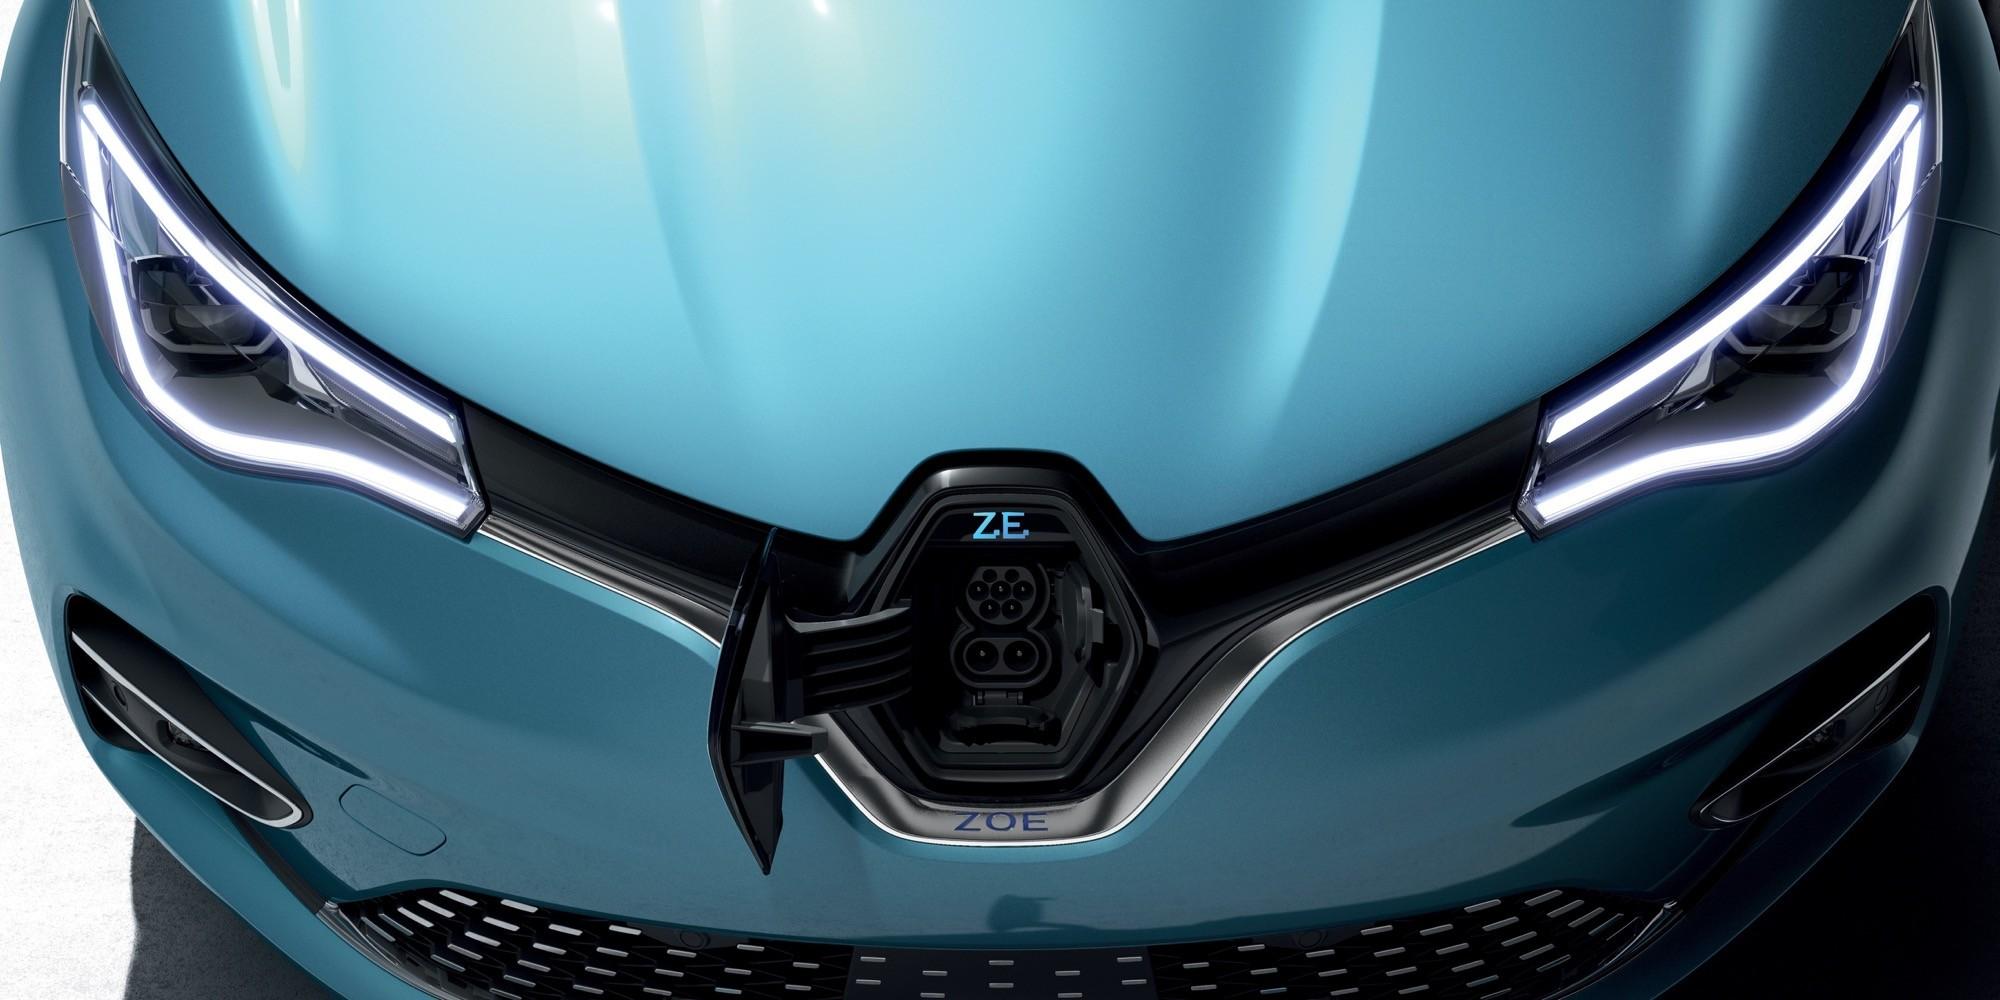 Elektroauto: Neuer Renault Zoe fährt 390 Kilometer weit - Renault Zoe (Bild: Renault)